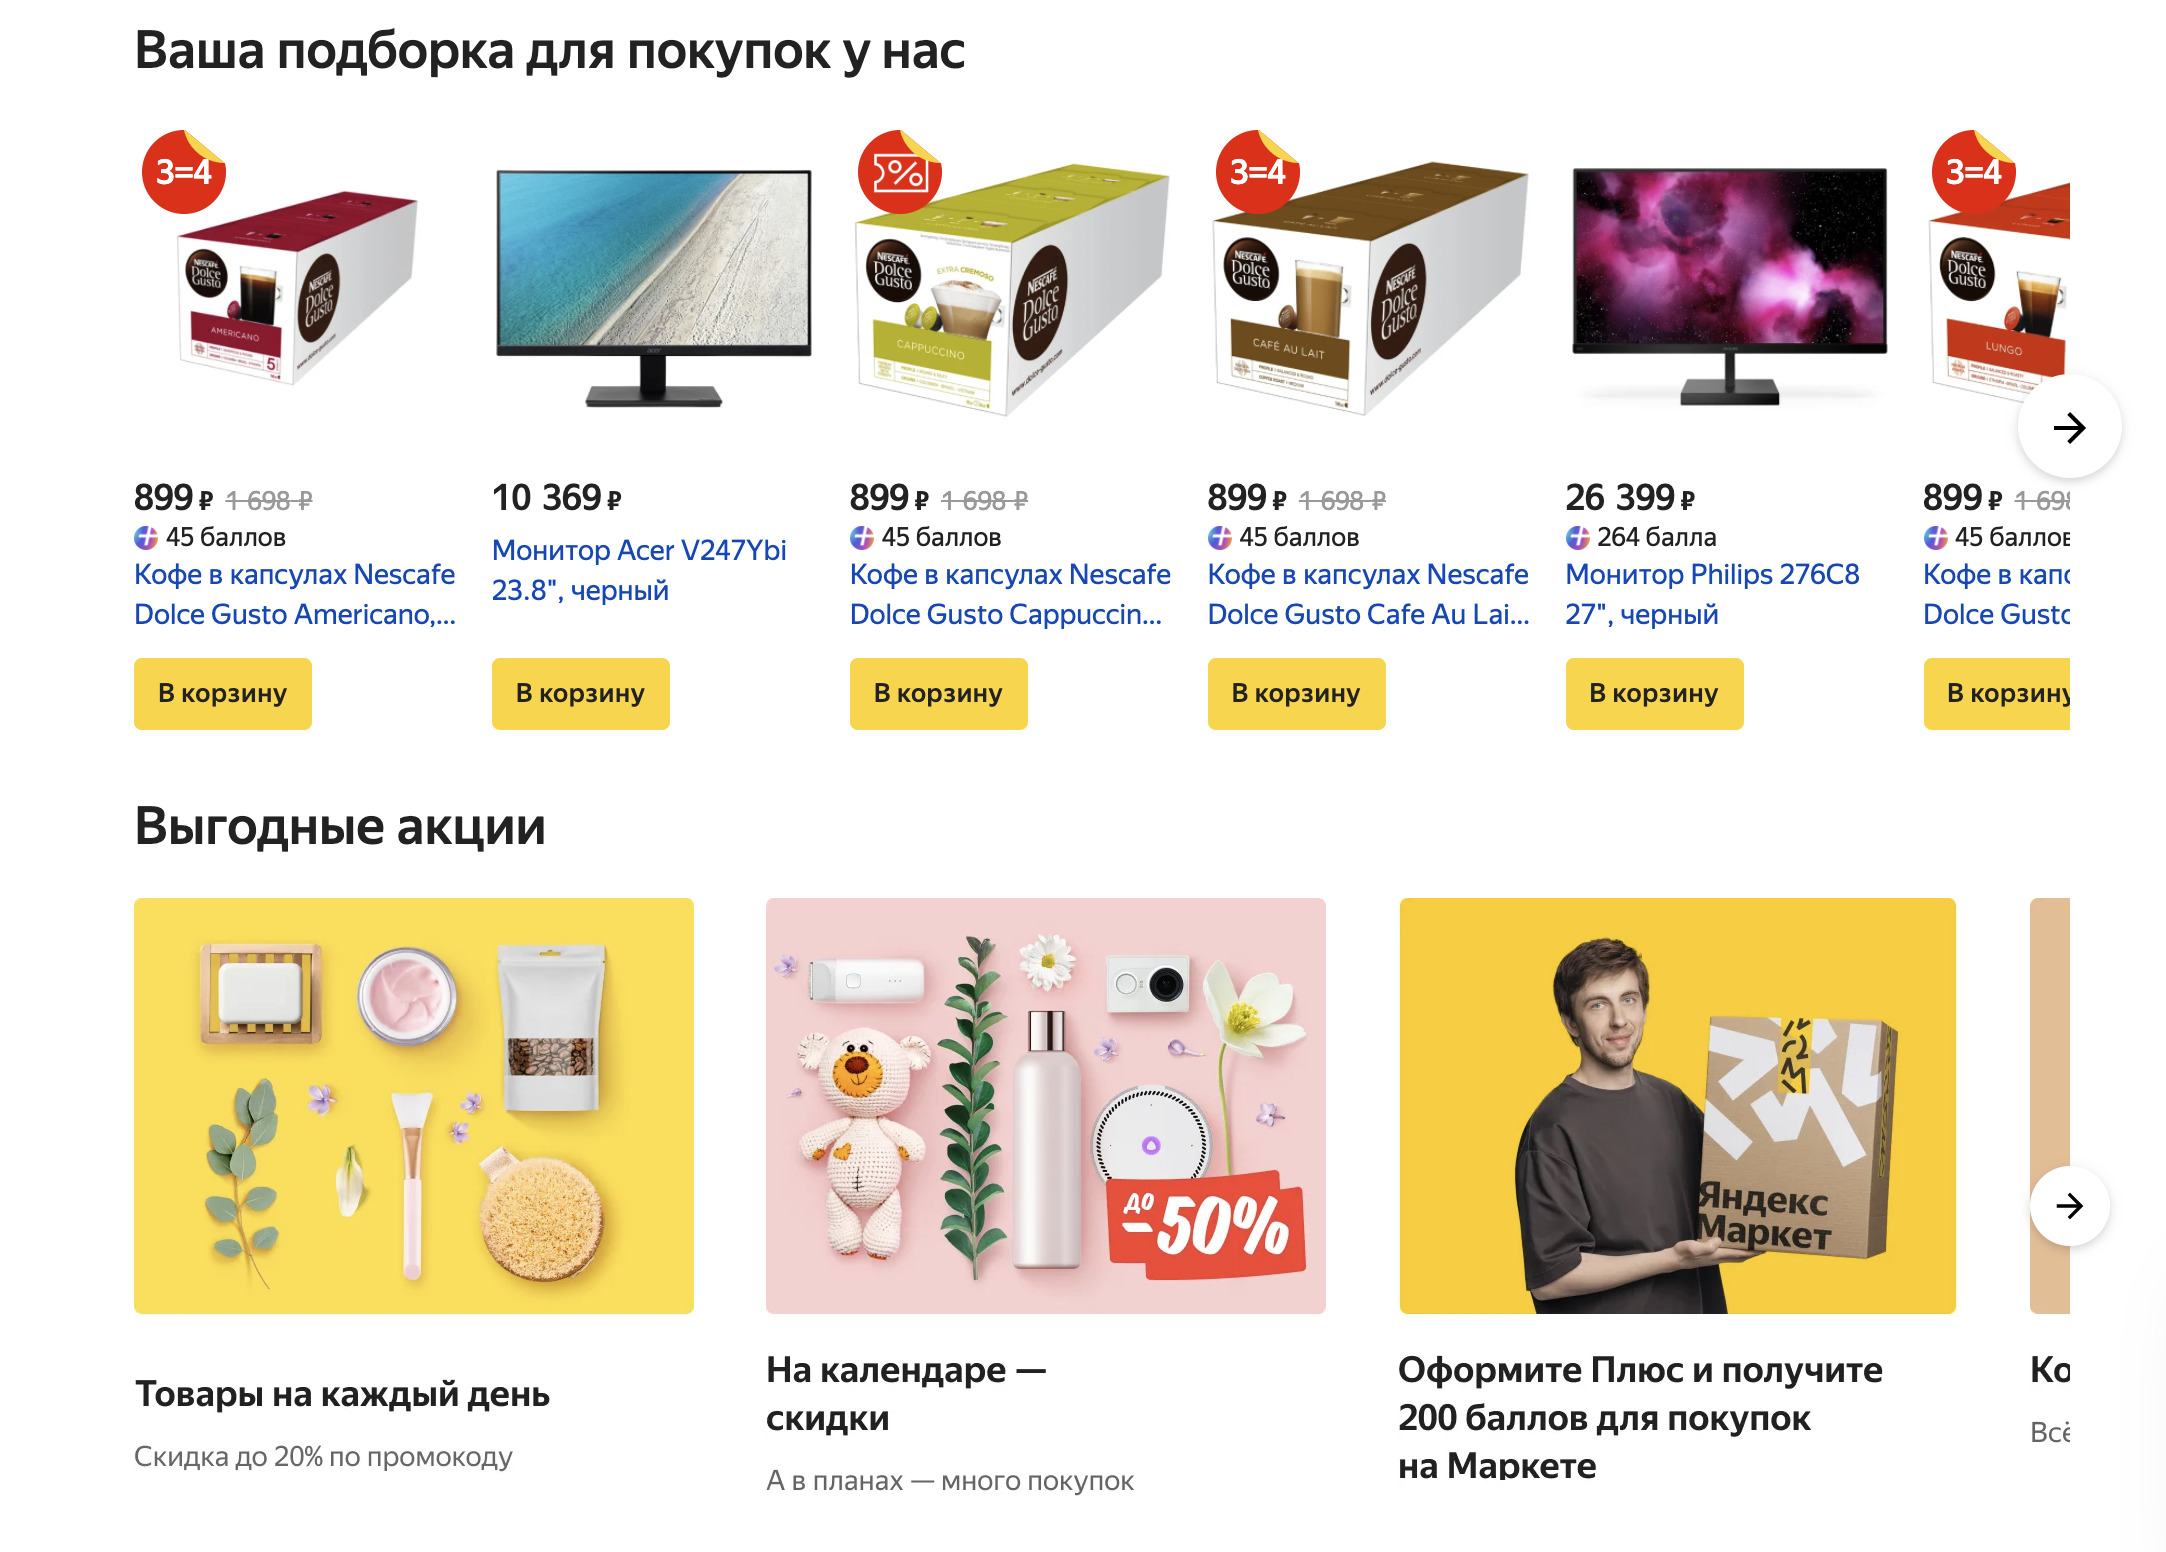 Доставка из Яндекс.Маркет в Москва, сроки, пункты выдачи, каталог